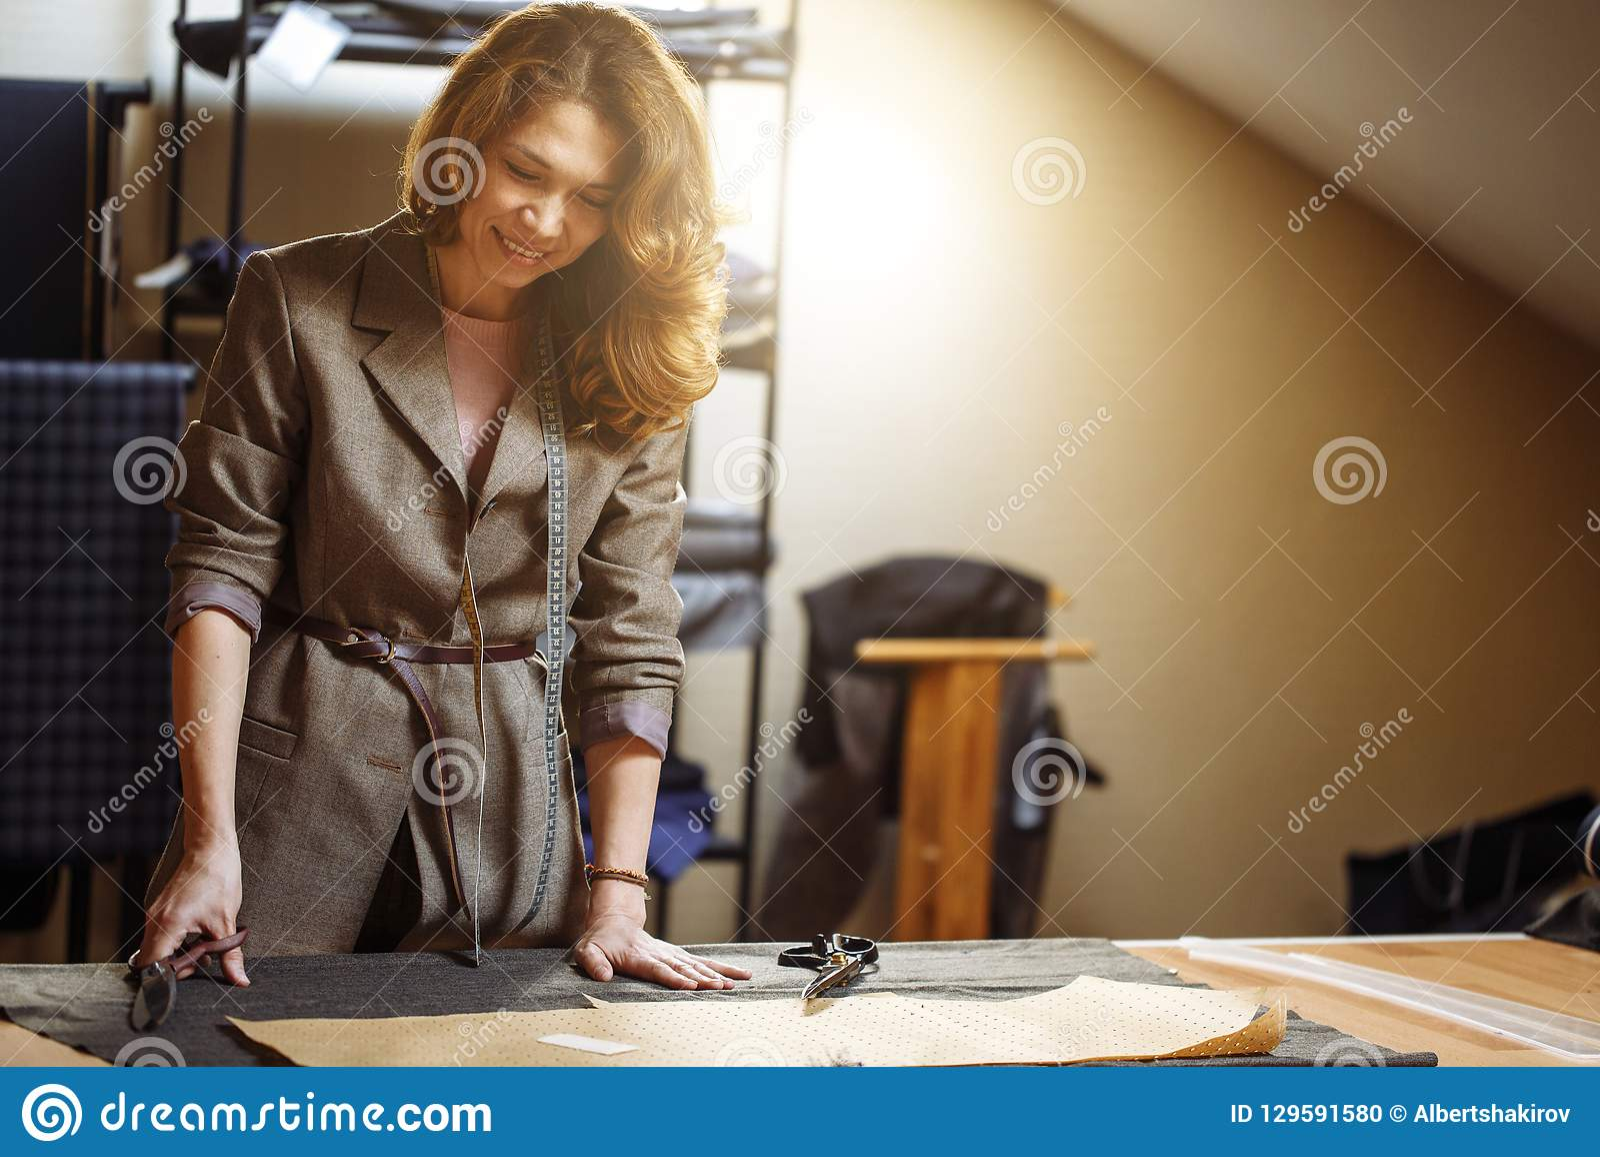 Pretty focused young woman fashion designer cutting grey fabric in studio